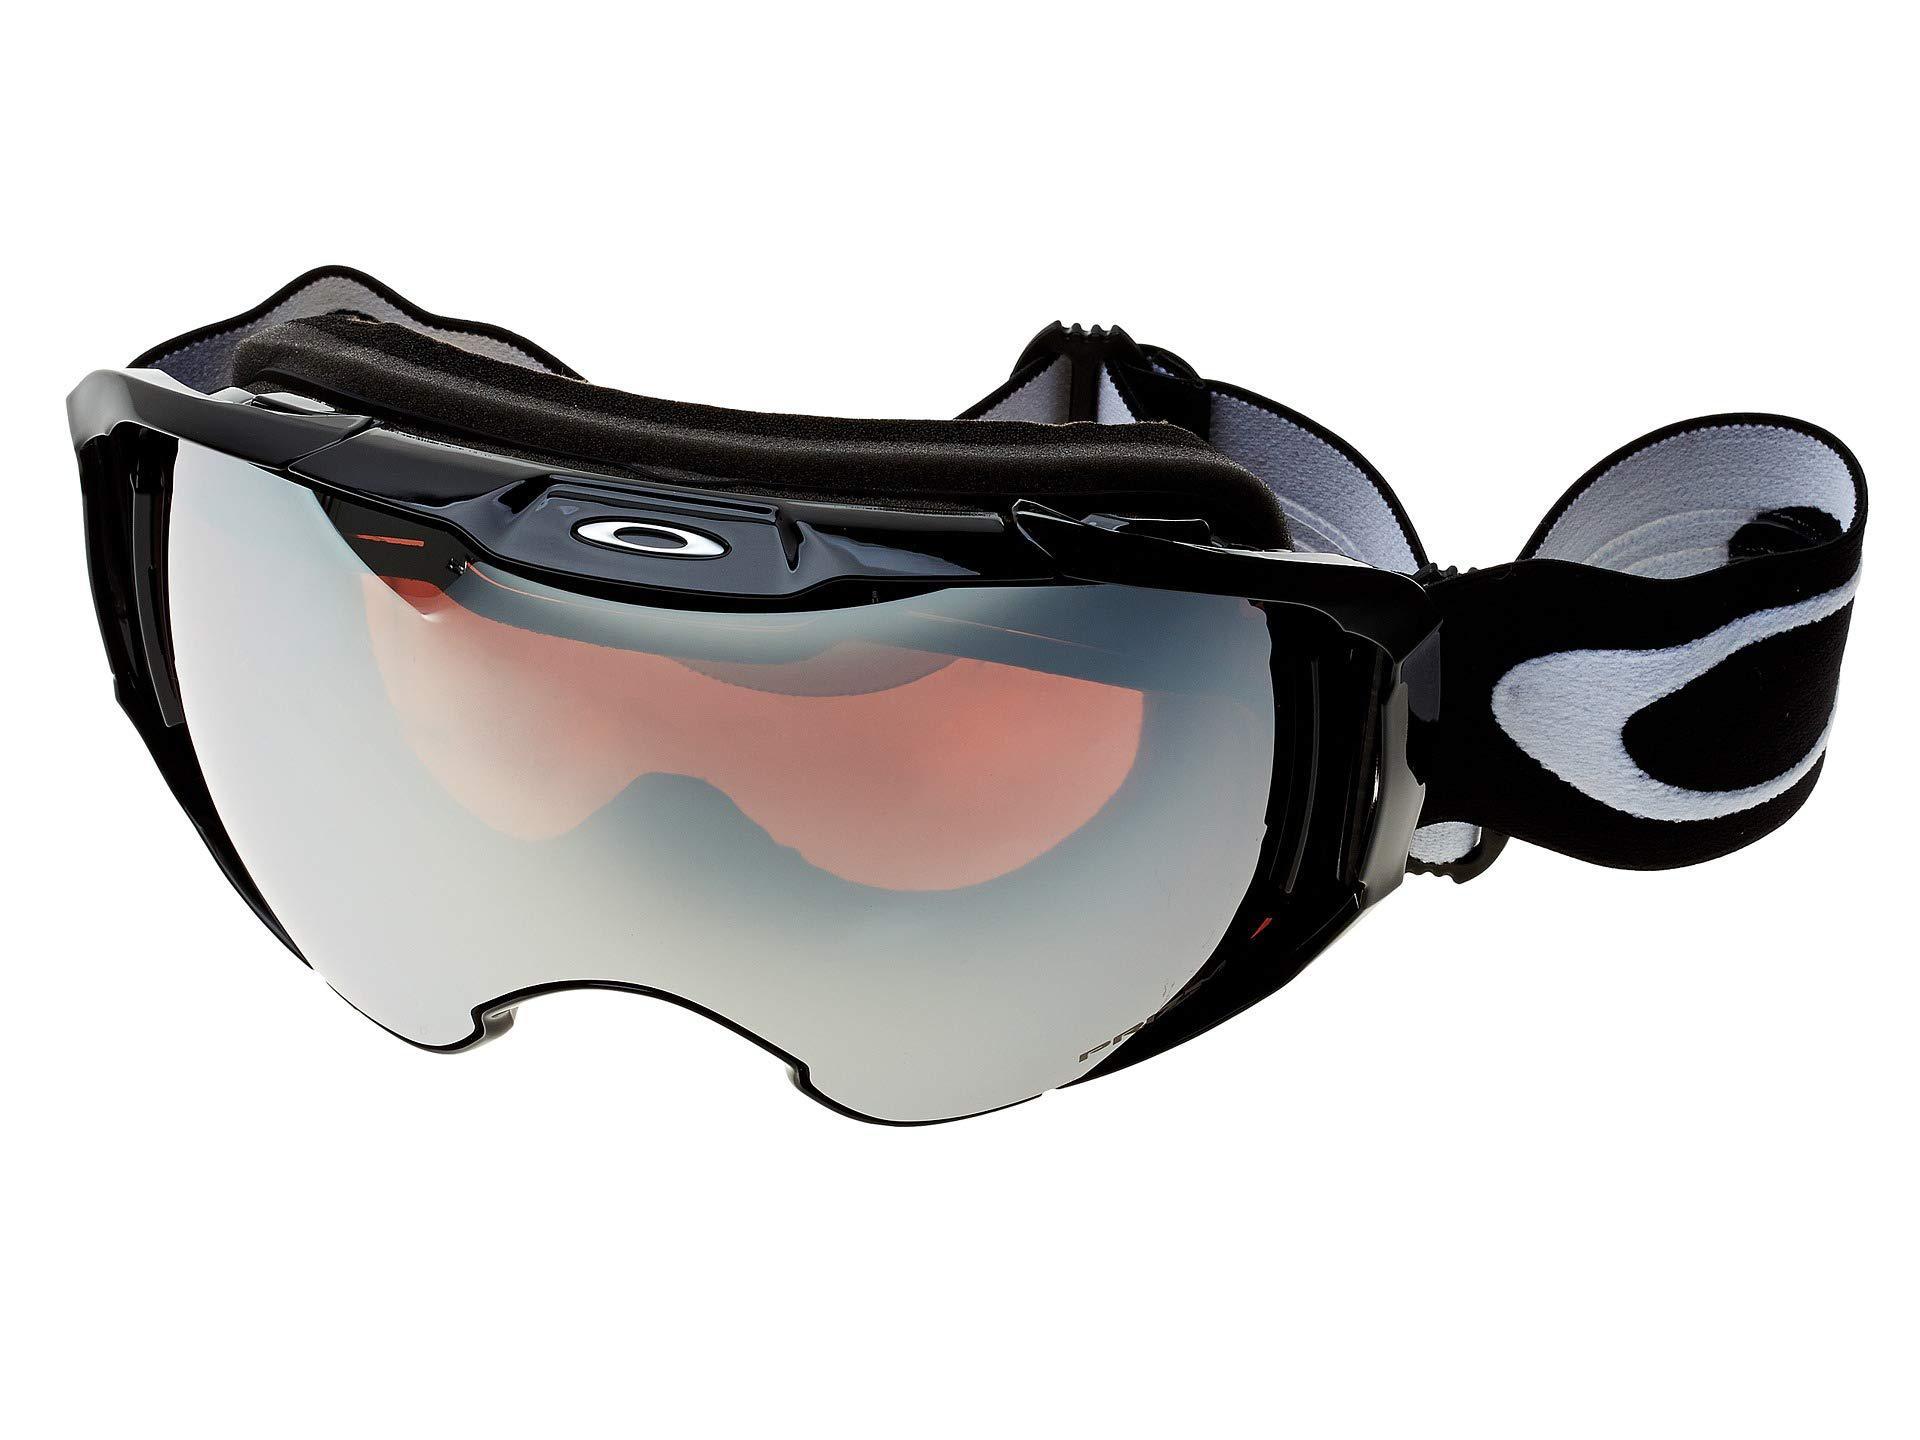 a1cfac49ebd Oakley. Men s Airbrake Xl - Large (jet Black prizm Black prizm Rose) Goggles